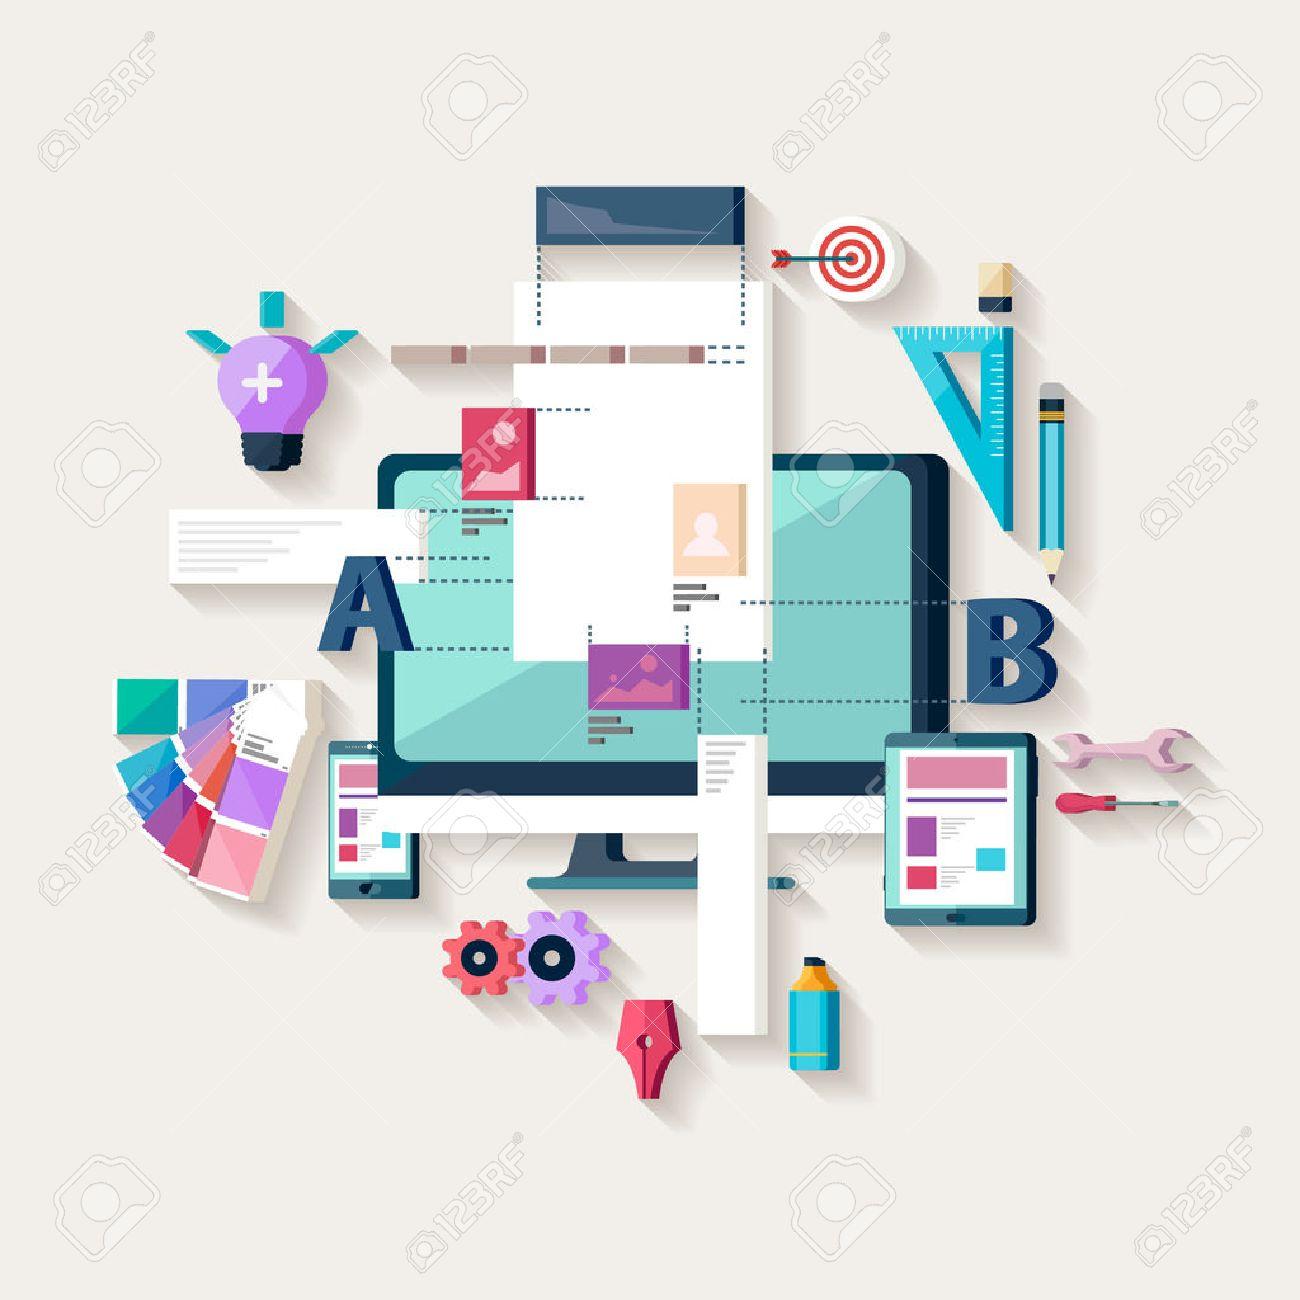 Web design, creating website. Flat design. - 47832976